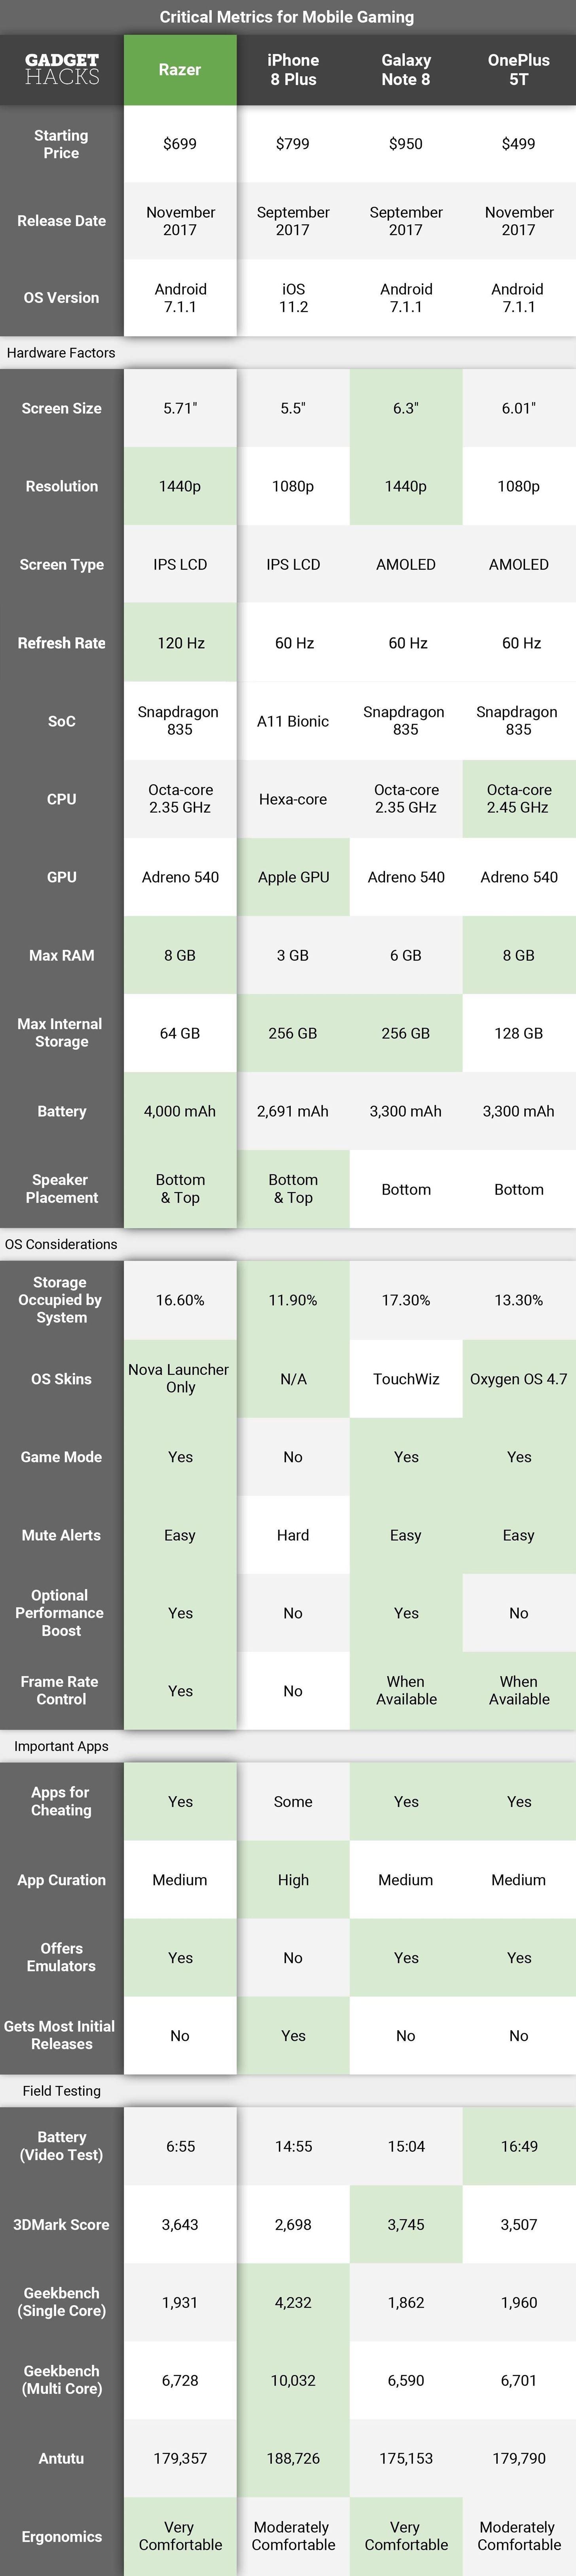 Ranked: The 4 Best Phones for Gaming « Smartphones :: Gadget Hacks